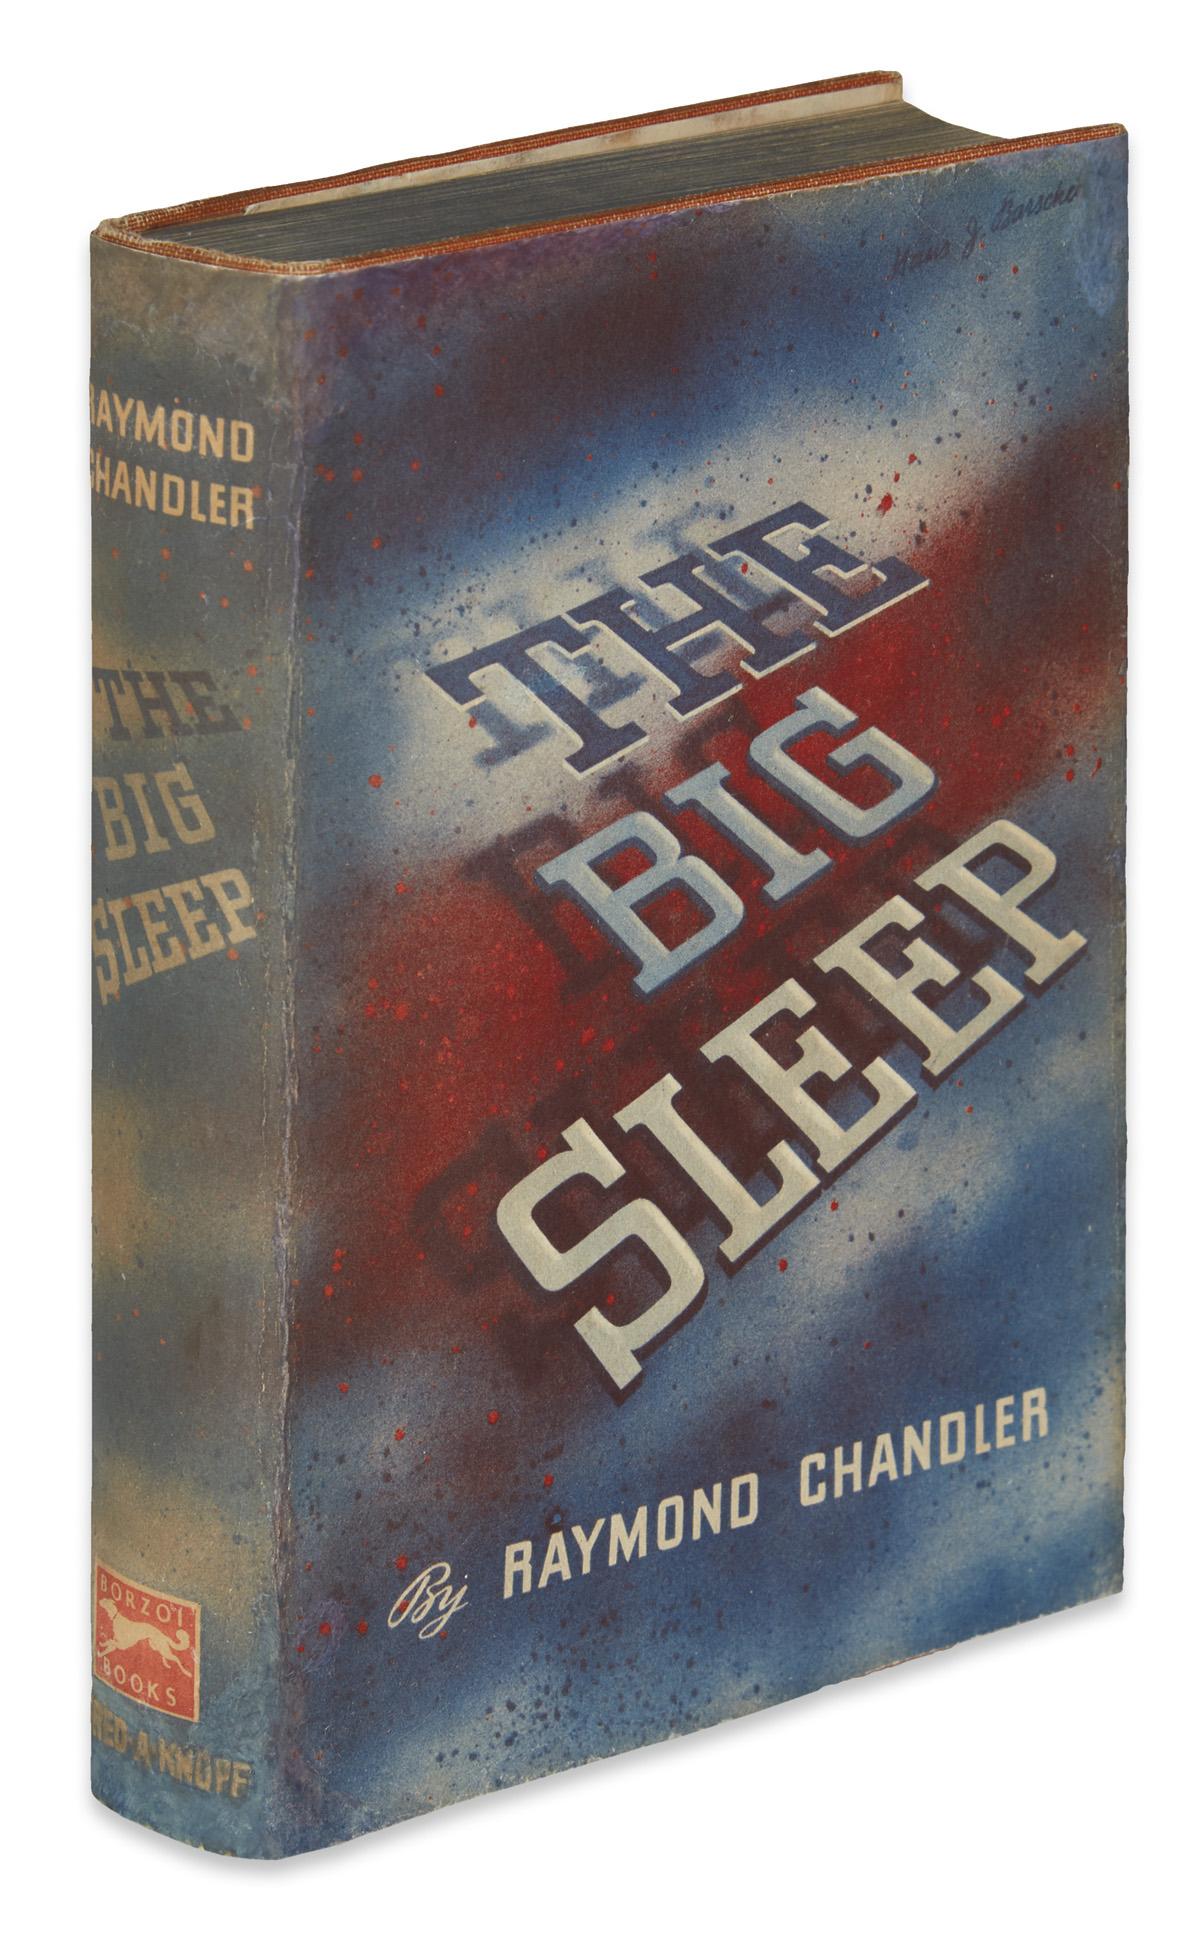 CHANDLER-RAYMOND-The-Big-Sleep